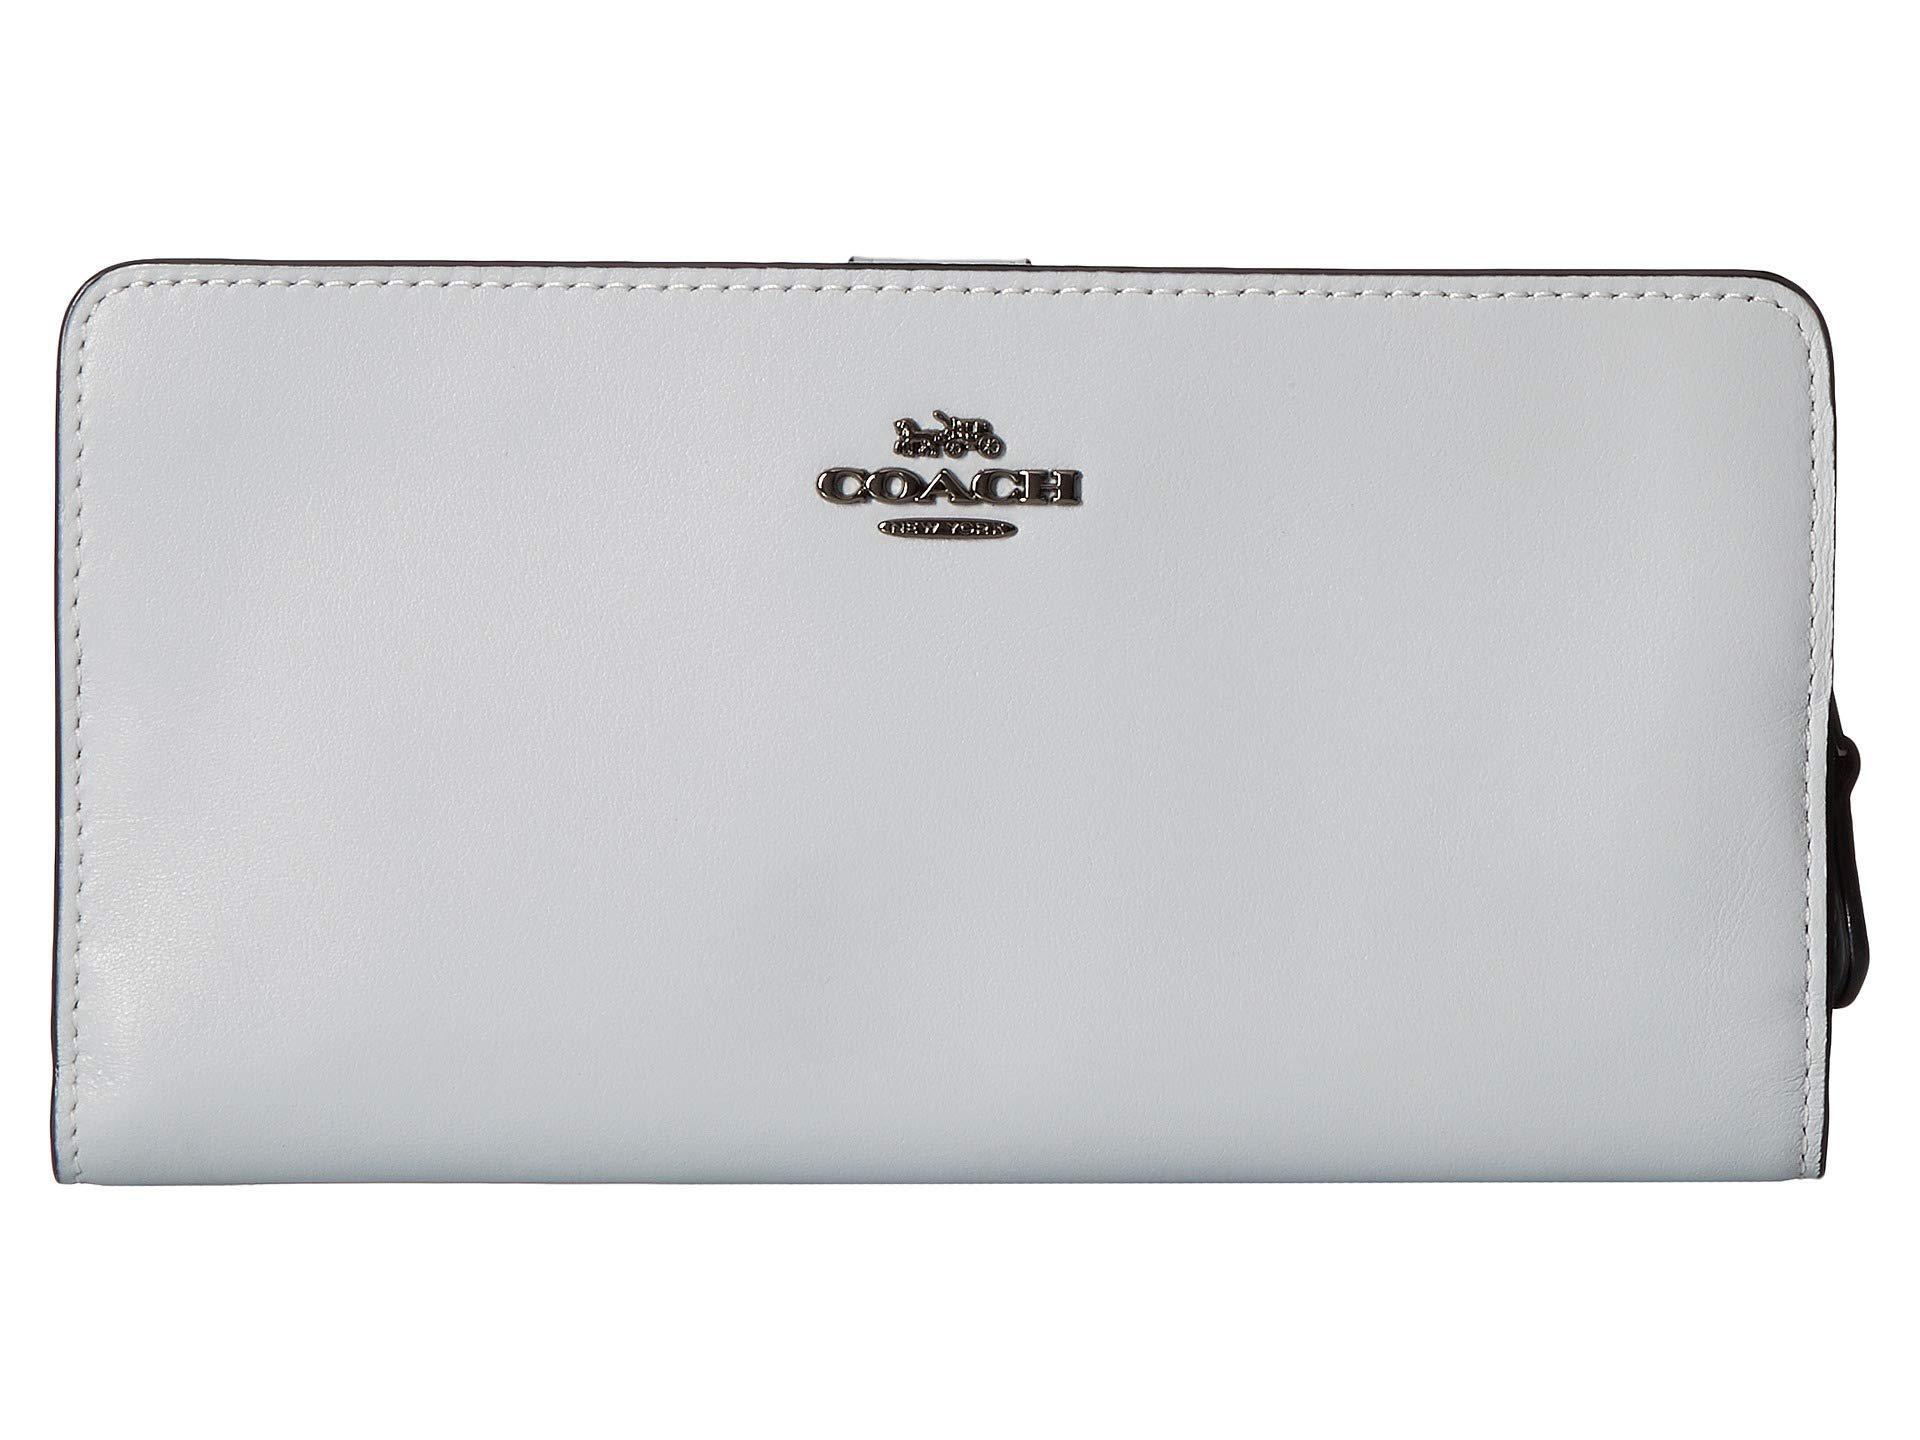 b78bf51860b5 Lyst - COACH Smooth Leather Skinny Wallet (li 1941 Saddle) Wallet ...